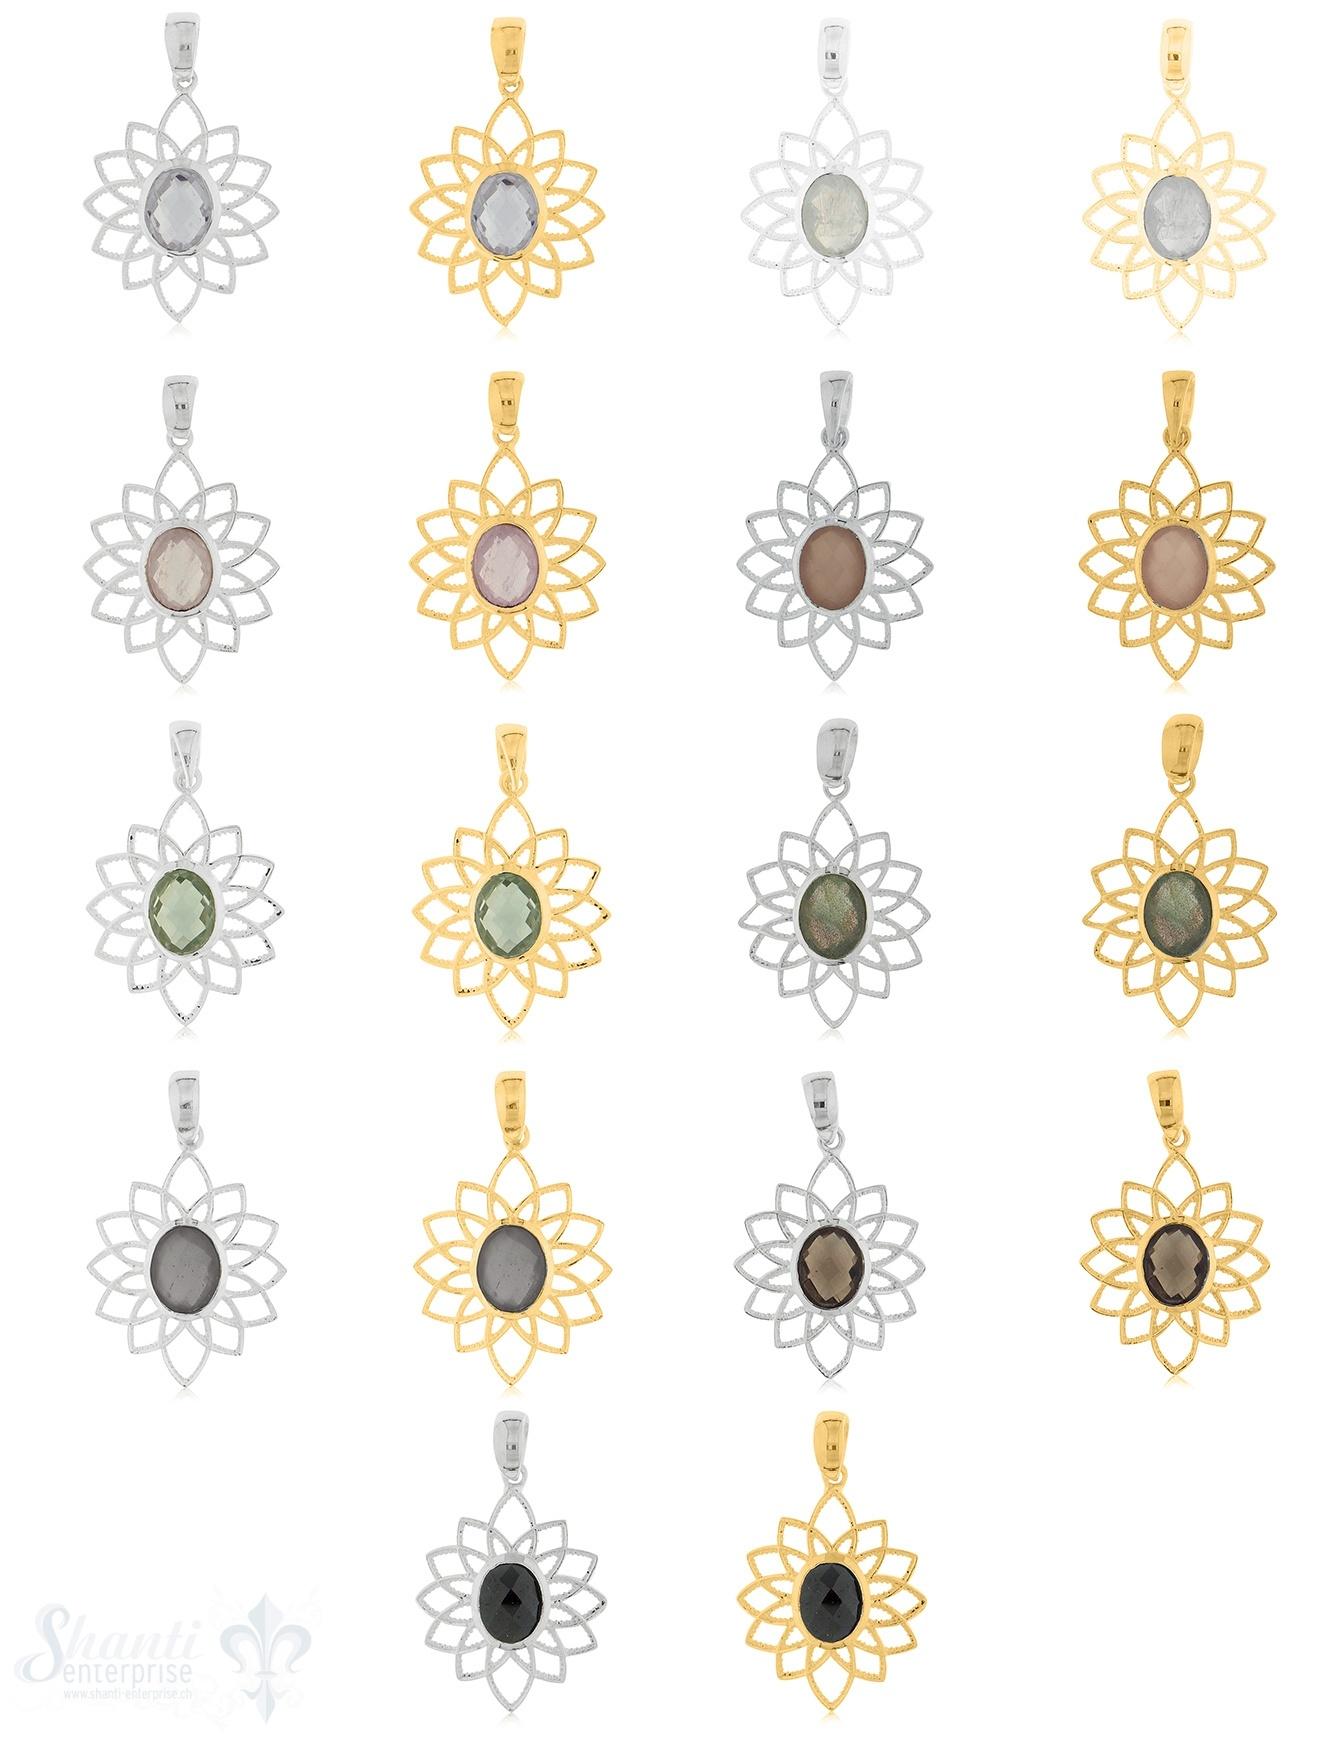 Anhänger Silber oval facett. Blumenblätter doppelreihig fein 21x28 mm mit Öse